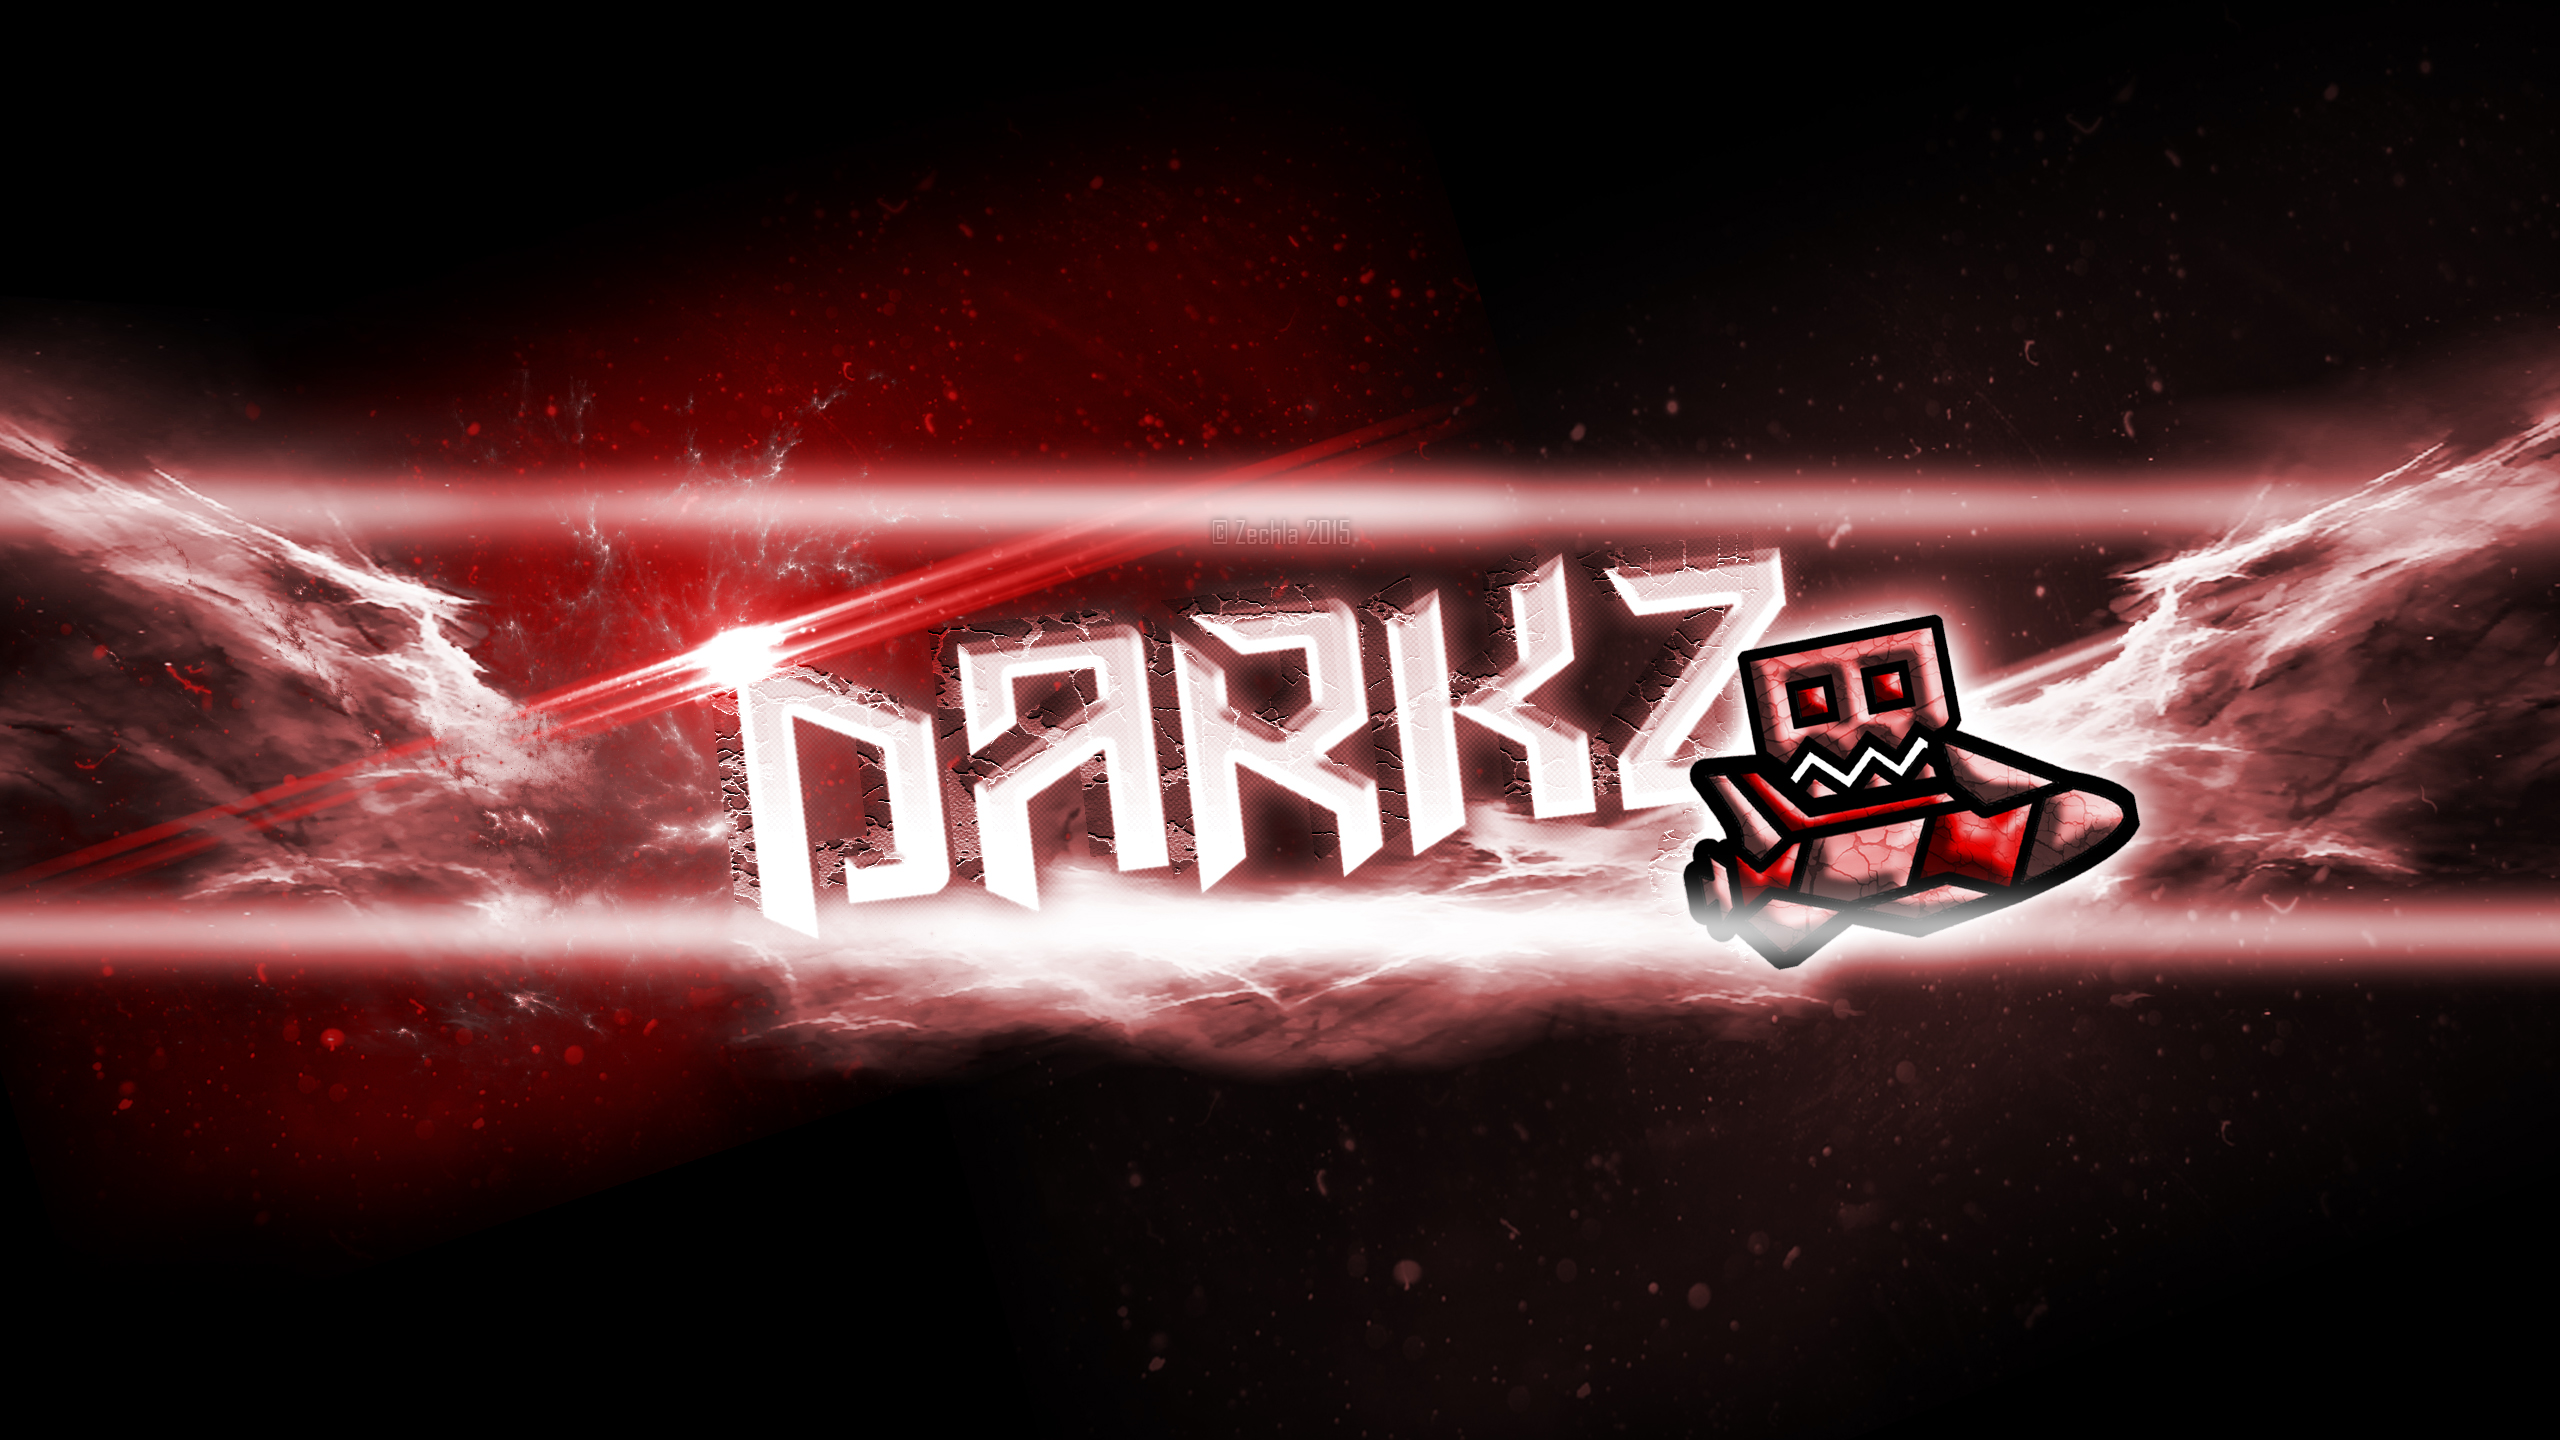 Geometry dash darkz s youtube banner by zechla on deviantart